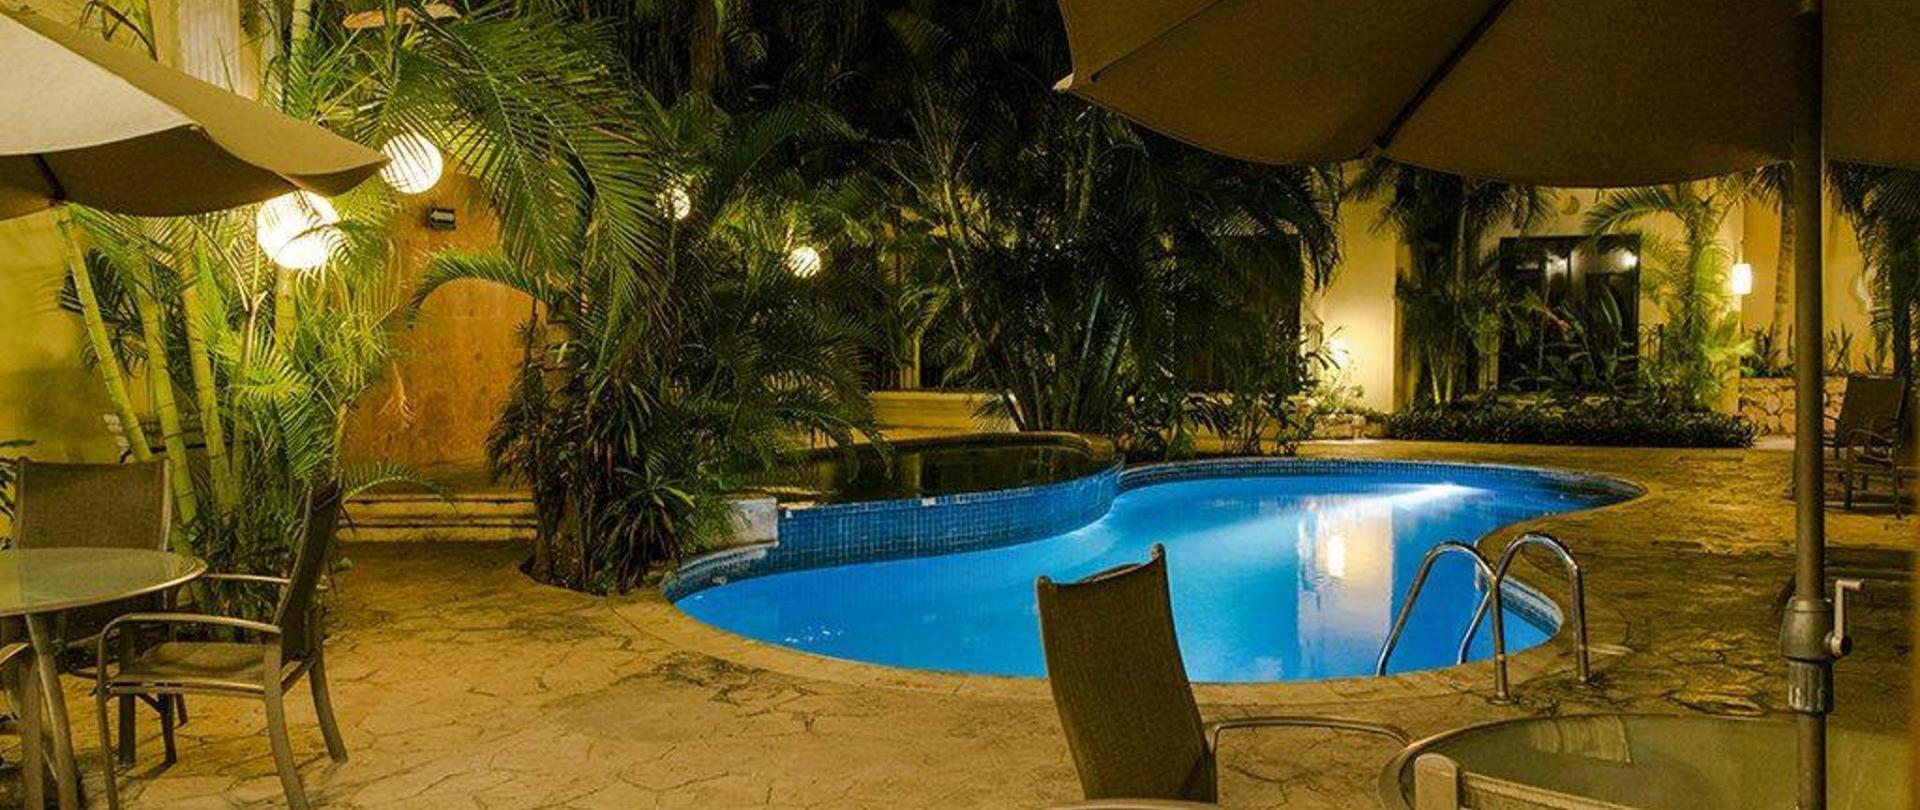 hotelpiscinanoche-1.jpg